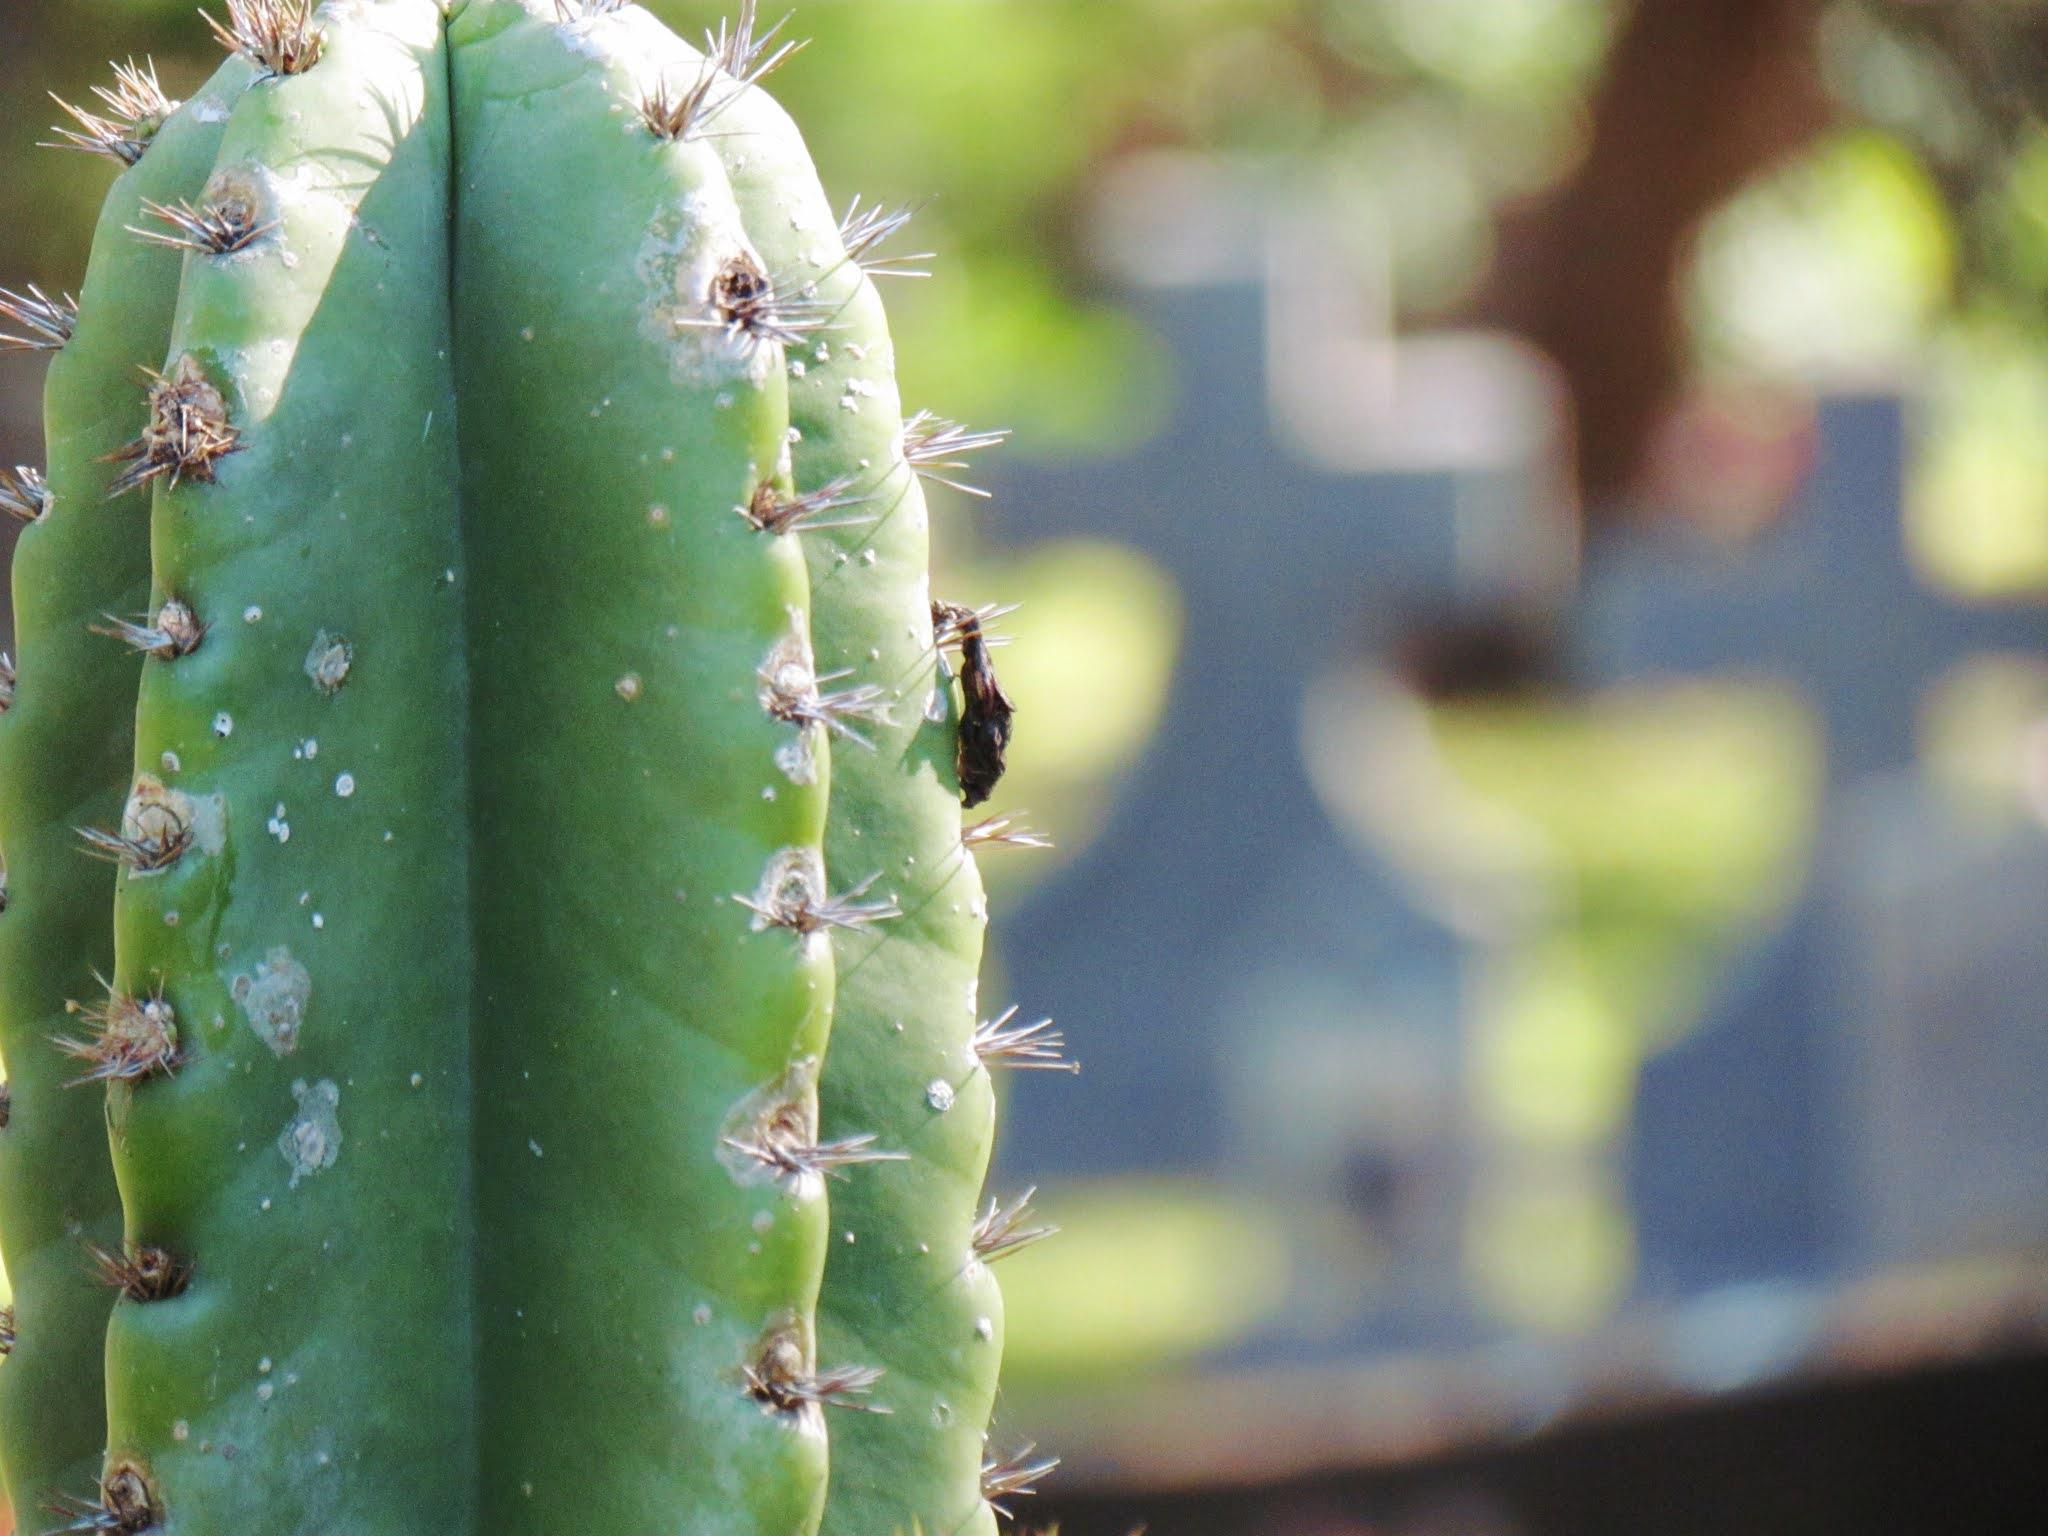 Saguaro cactus bloom + blurred photography photo challenge, cactus plant, desert cactus, desert blooms